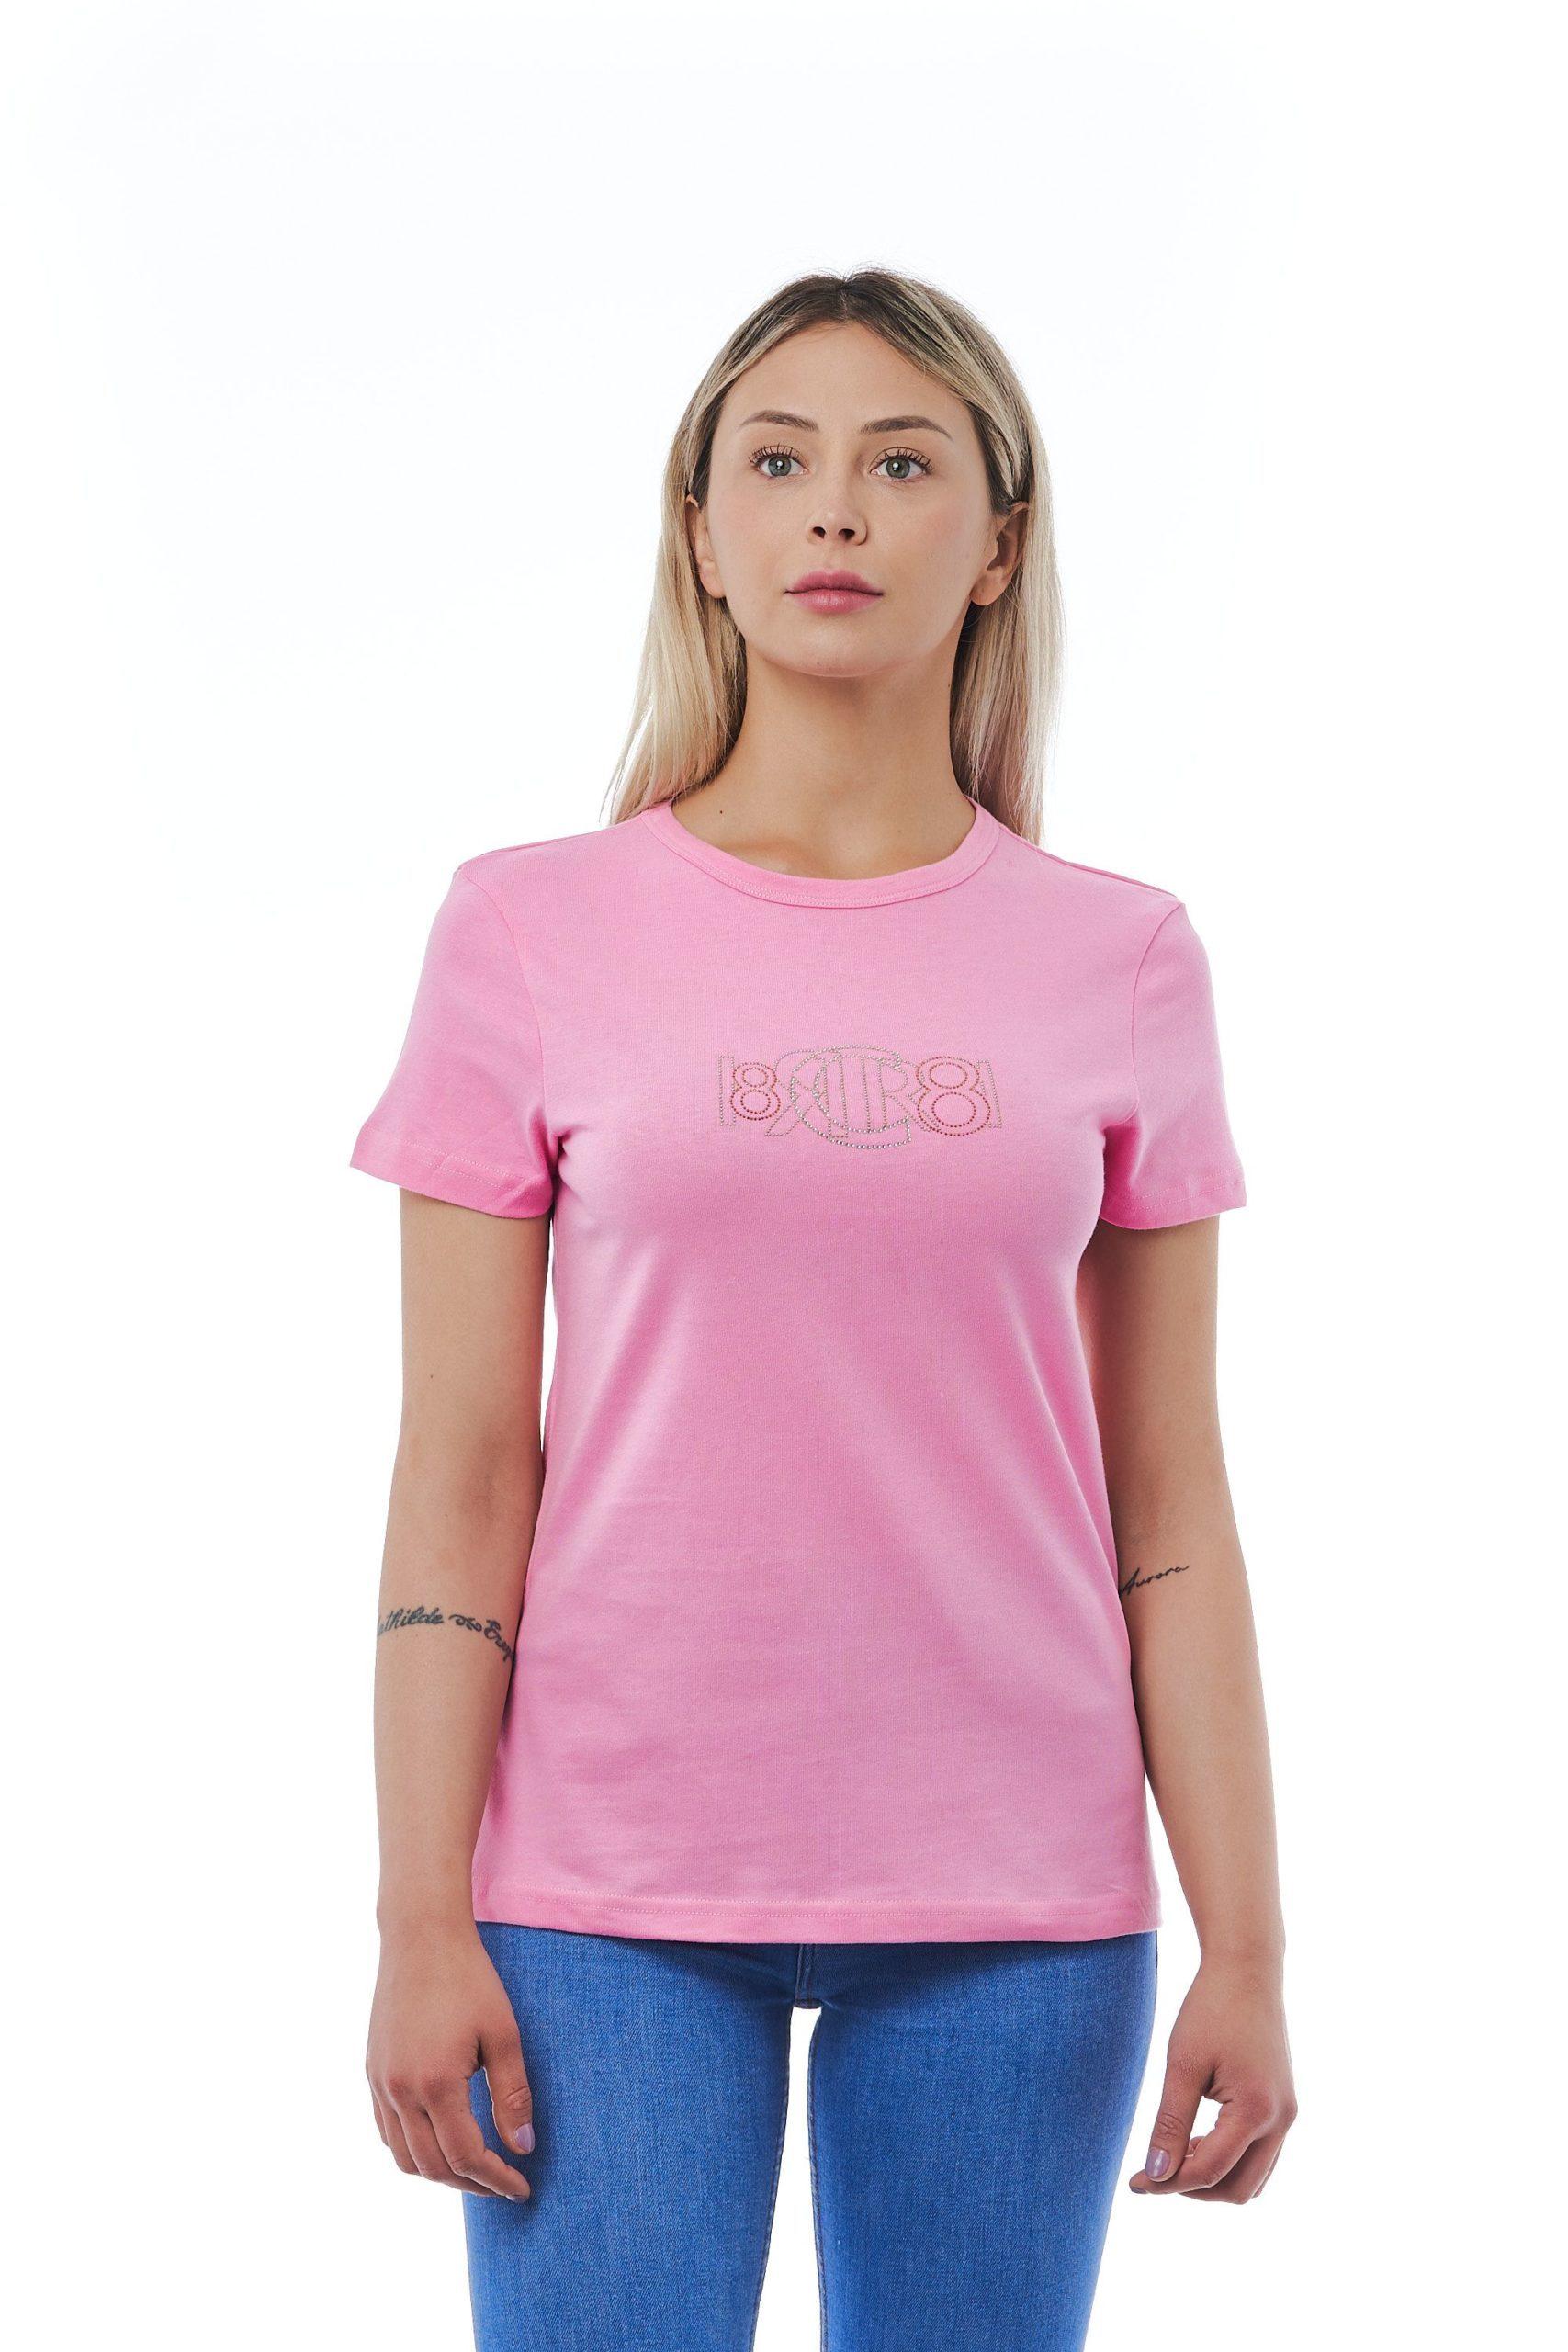 Cerruti 1881 Women's Rosa T-Shirt Pink CE1410195 - M